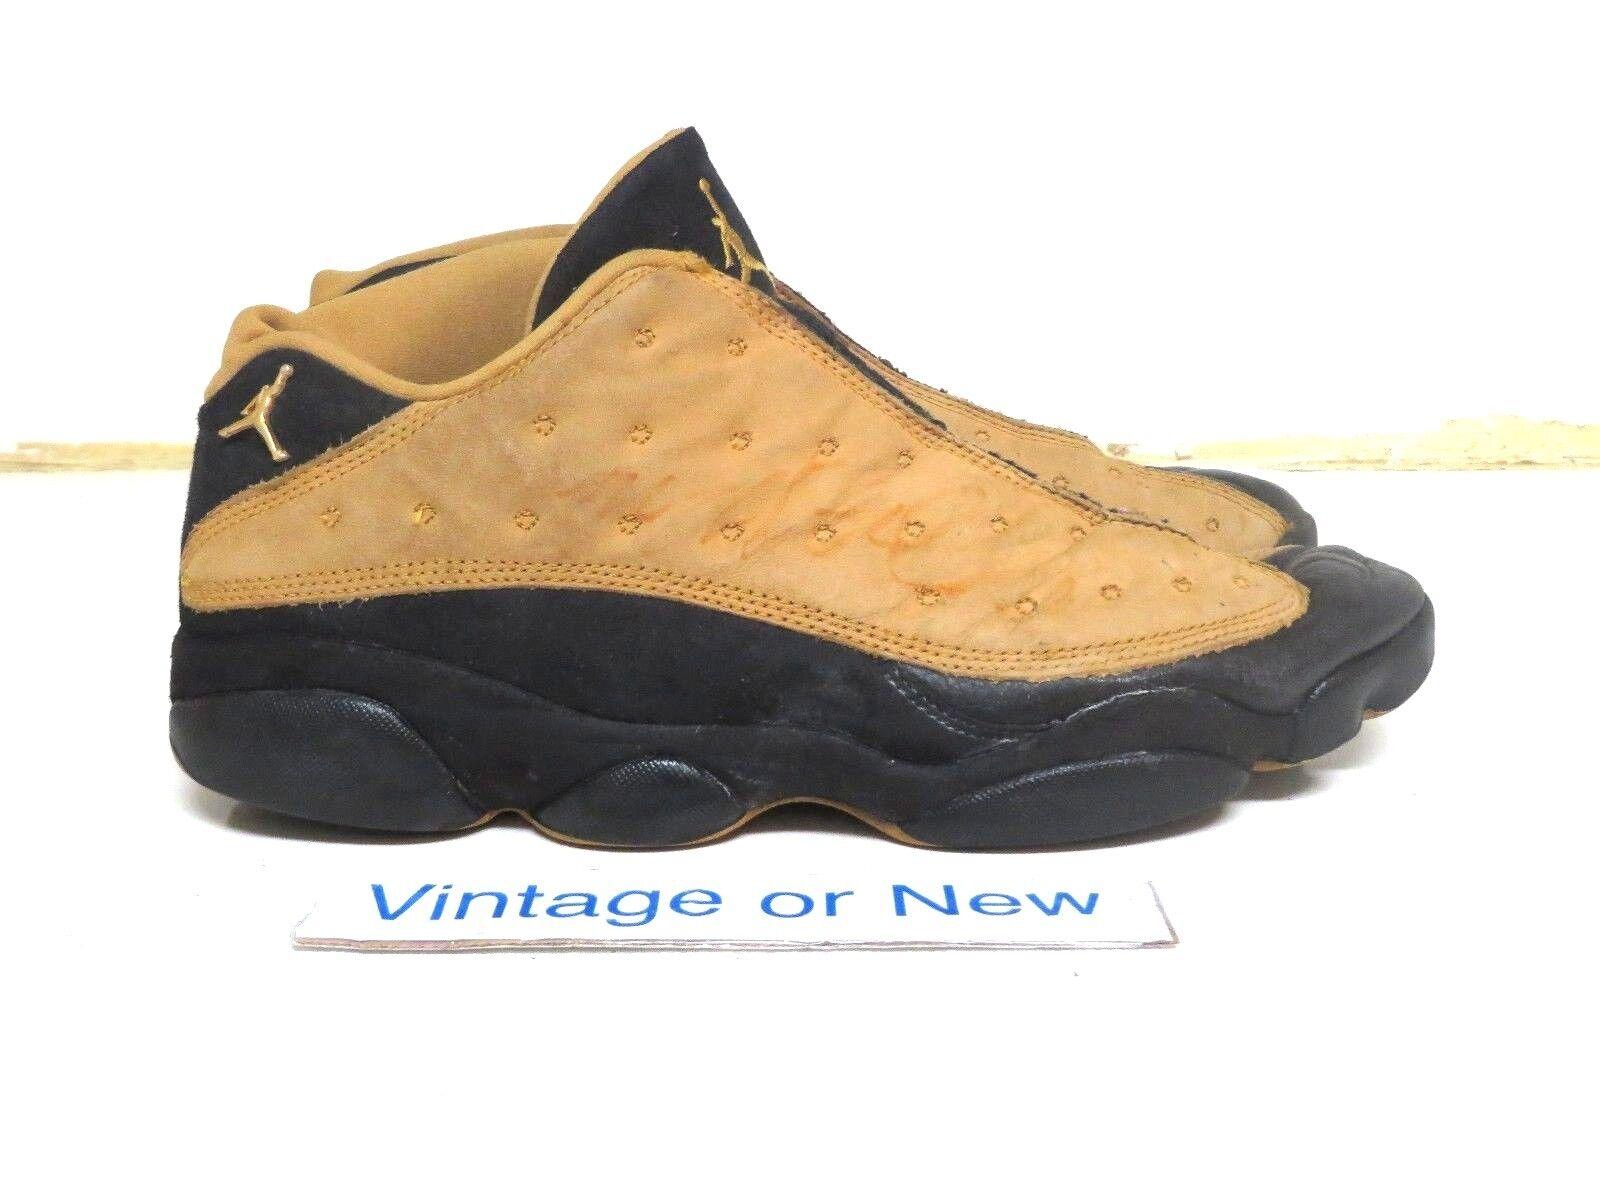 purchase cheap 16122 08384 OG Air Jordan XIII 13 Low Black Chutney 1998 1998 1998 sz 12 927c84